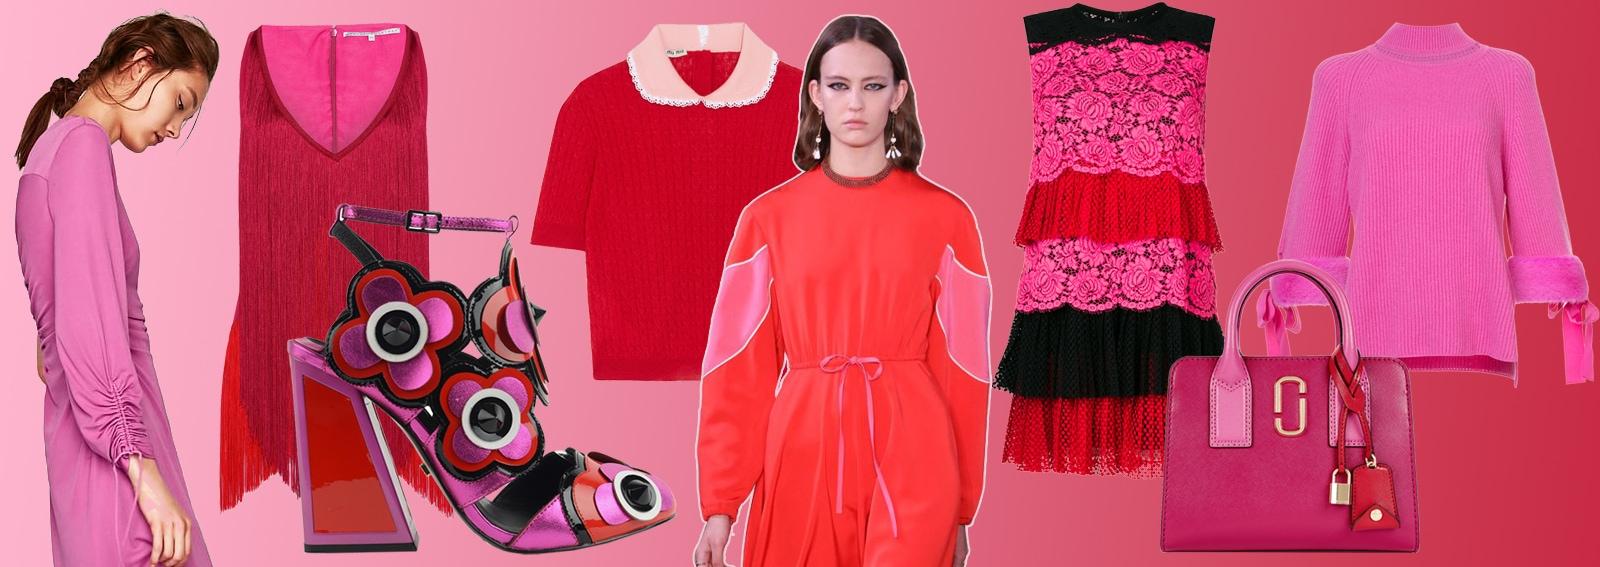 DESKTOP_pink_rouge